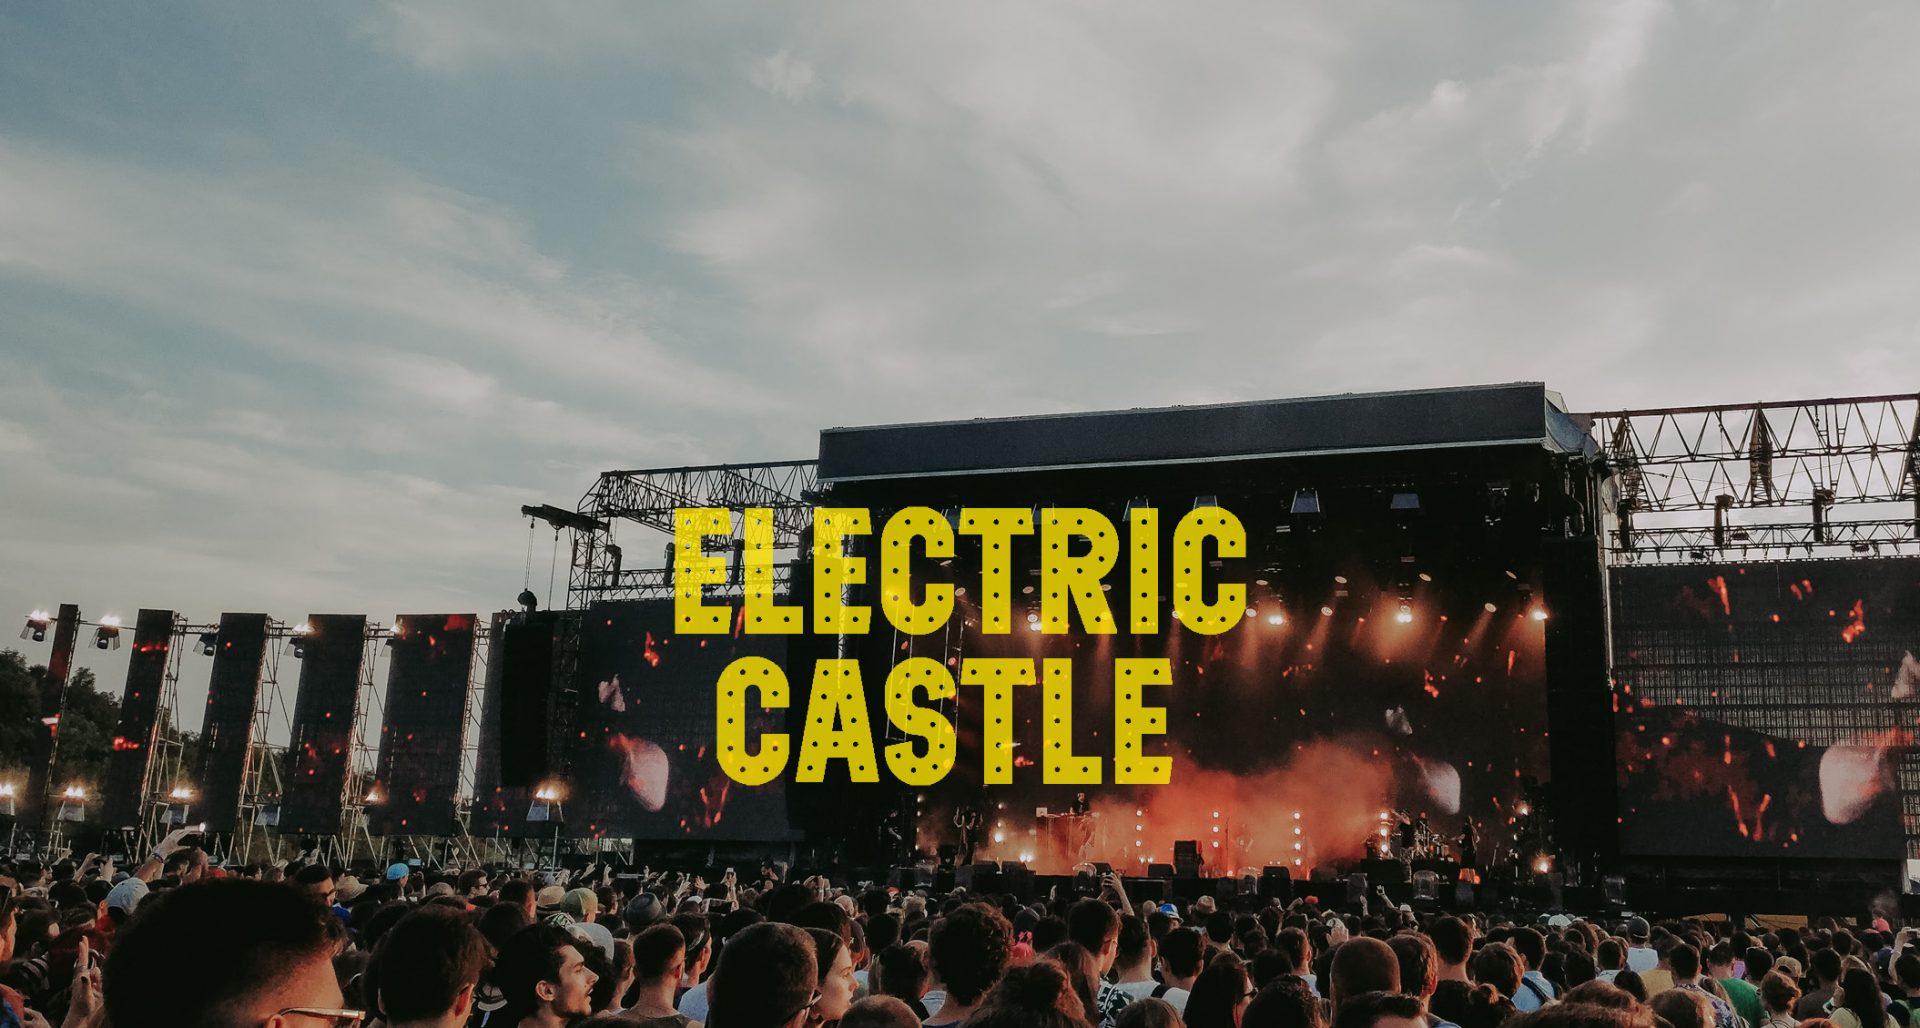 Electric Castle 2018   Banffy Castle Bontida   youngcreative.info media